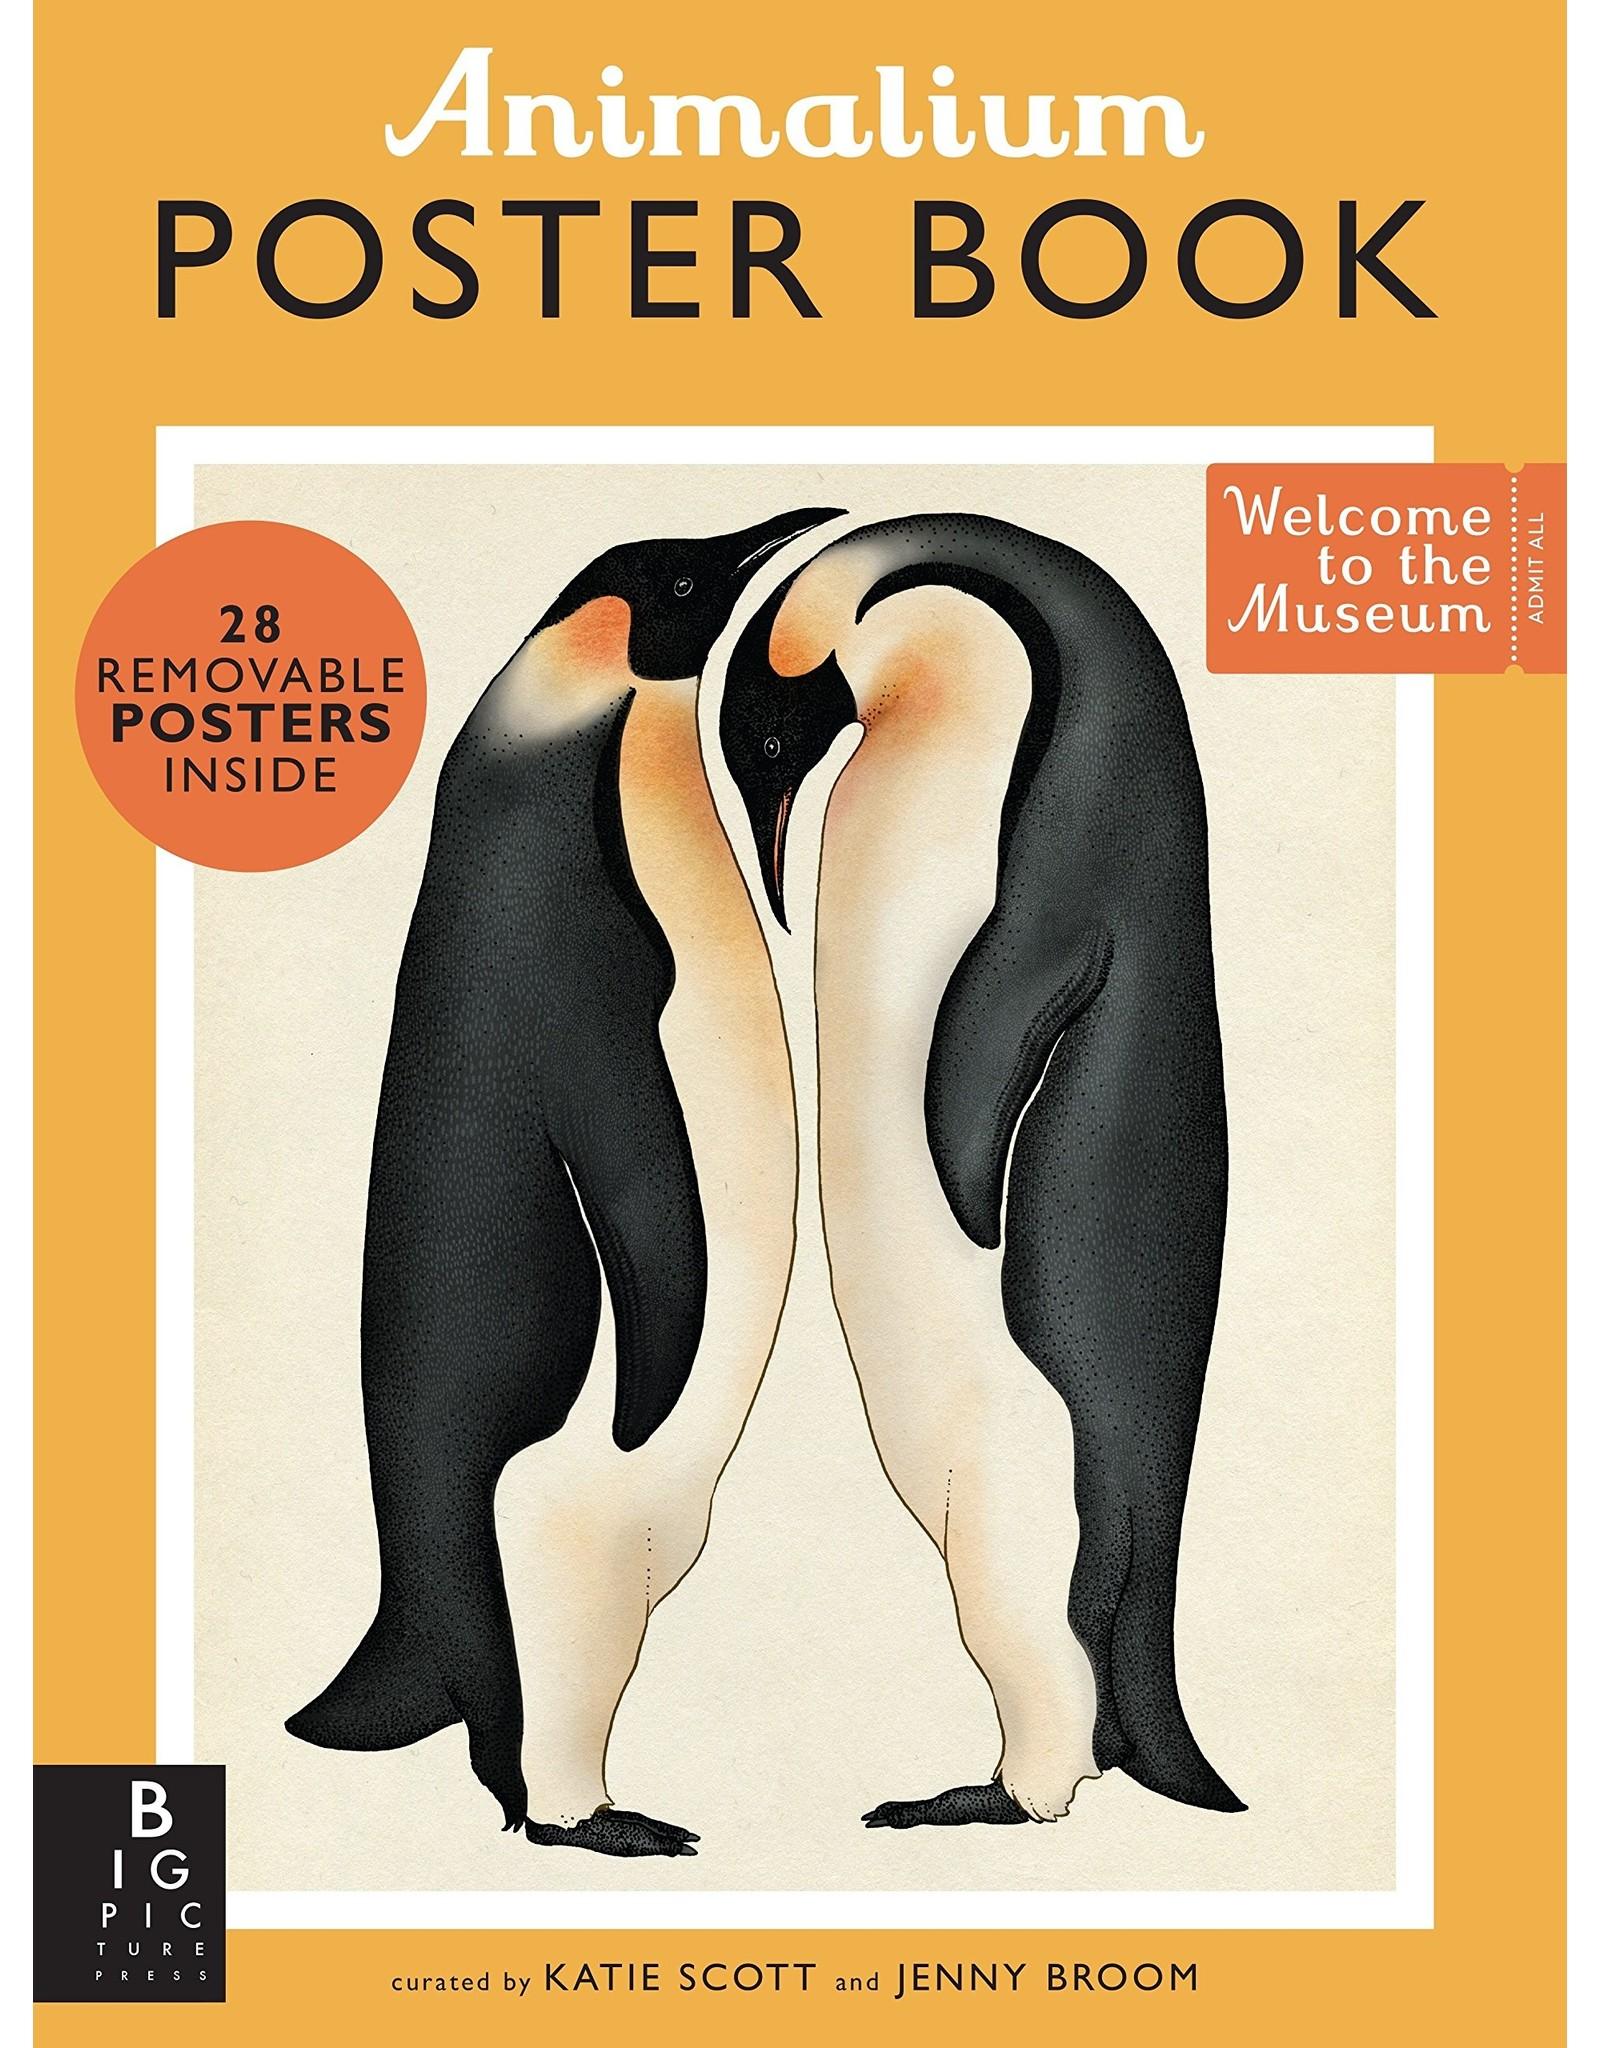 Penguin Random House ANIMALIUM POSTER BOOK